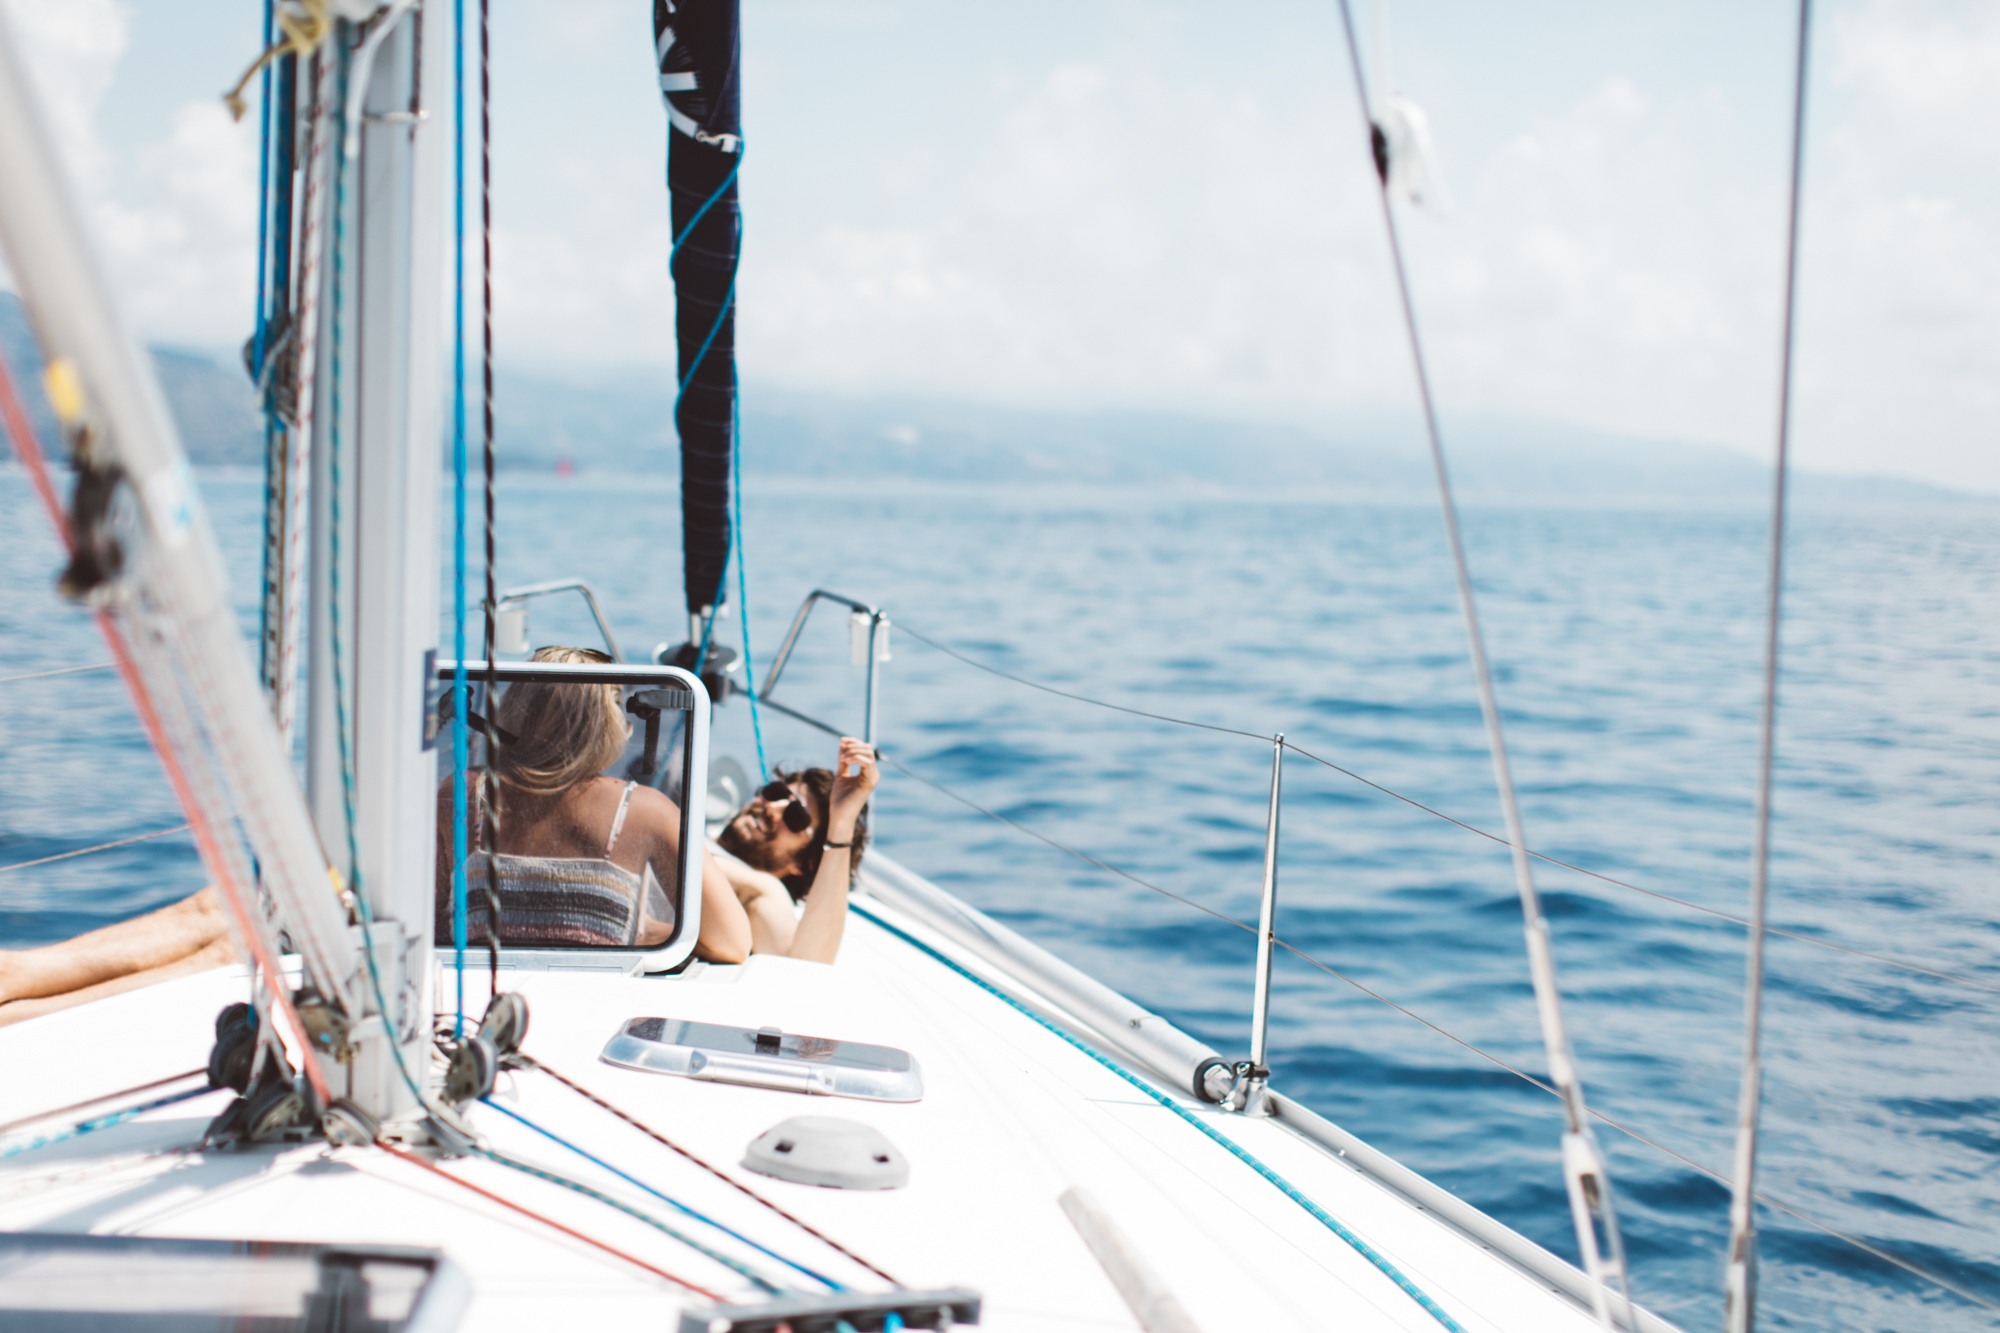 152-EpicBoatJourney-4266.jpg